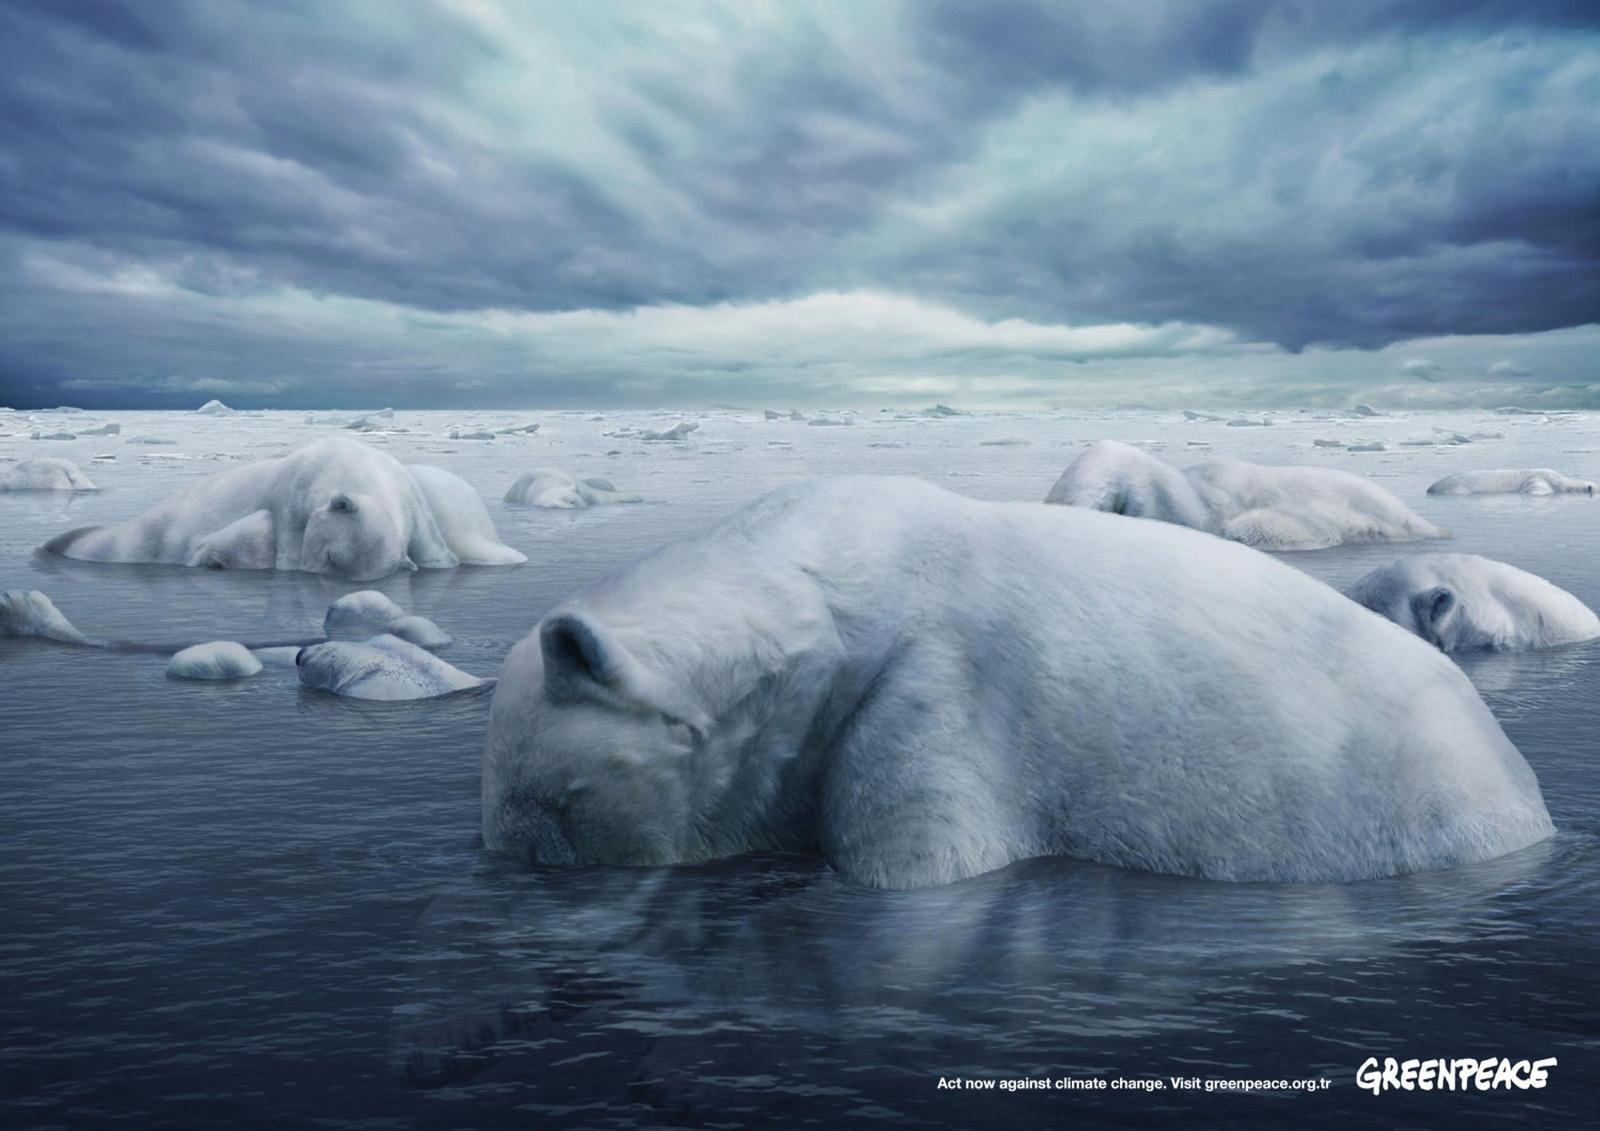 greenpeace-polar-bears1.jpg